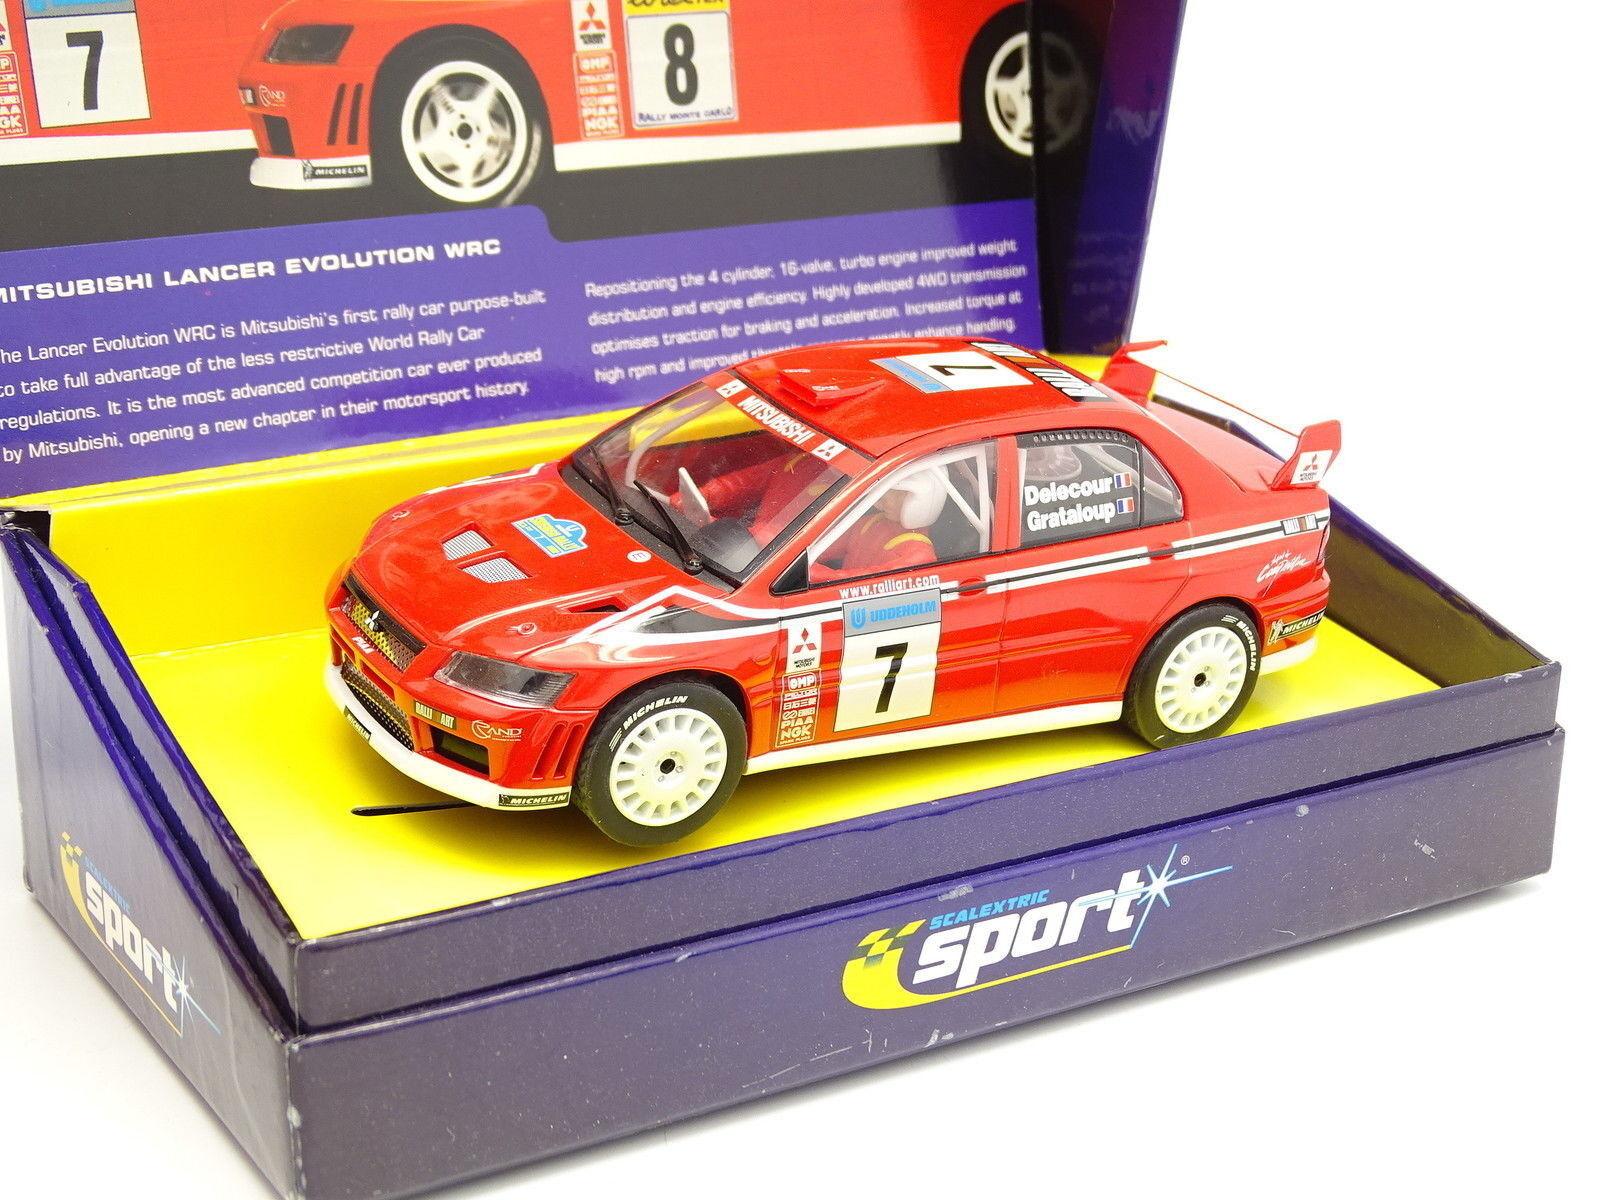 Scalextric Slot Car 1 32 - Mitsubishi Lancer WRC Schweden Rally Delecour